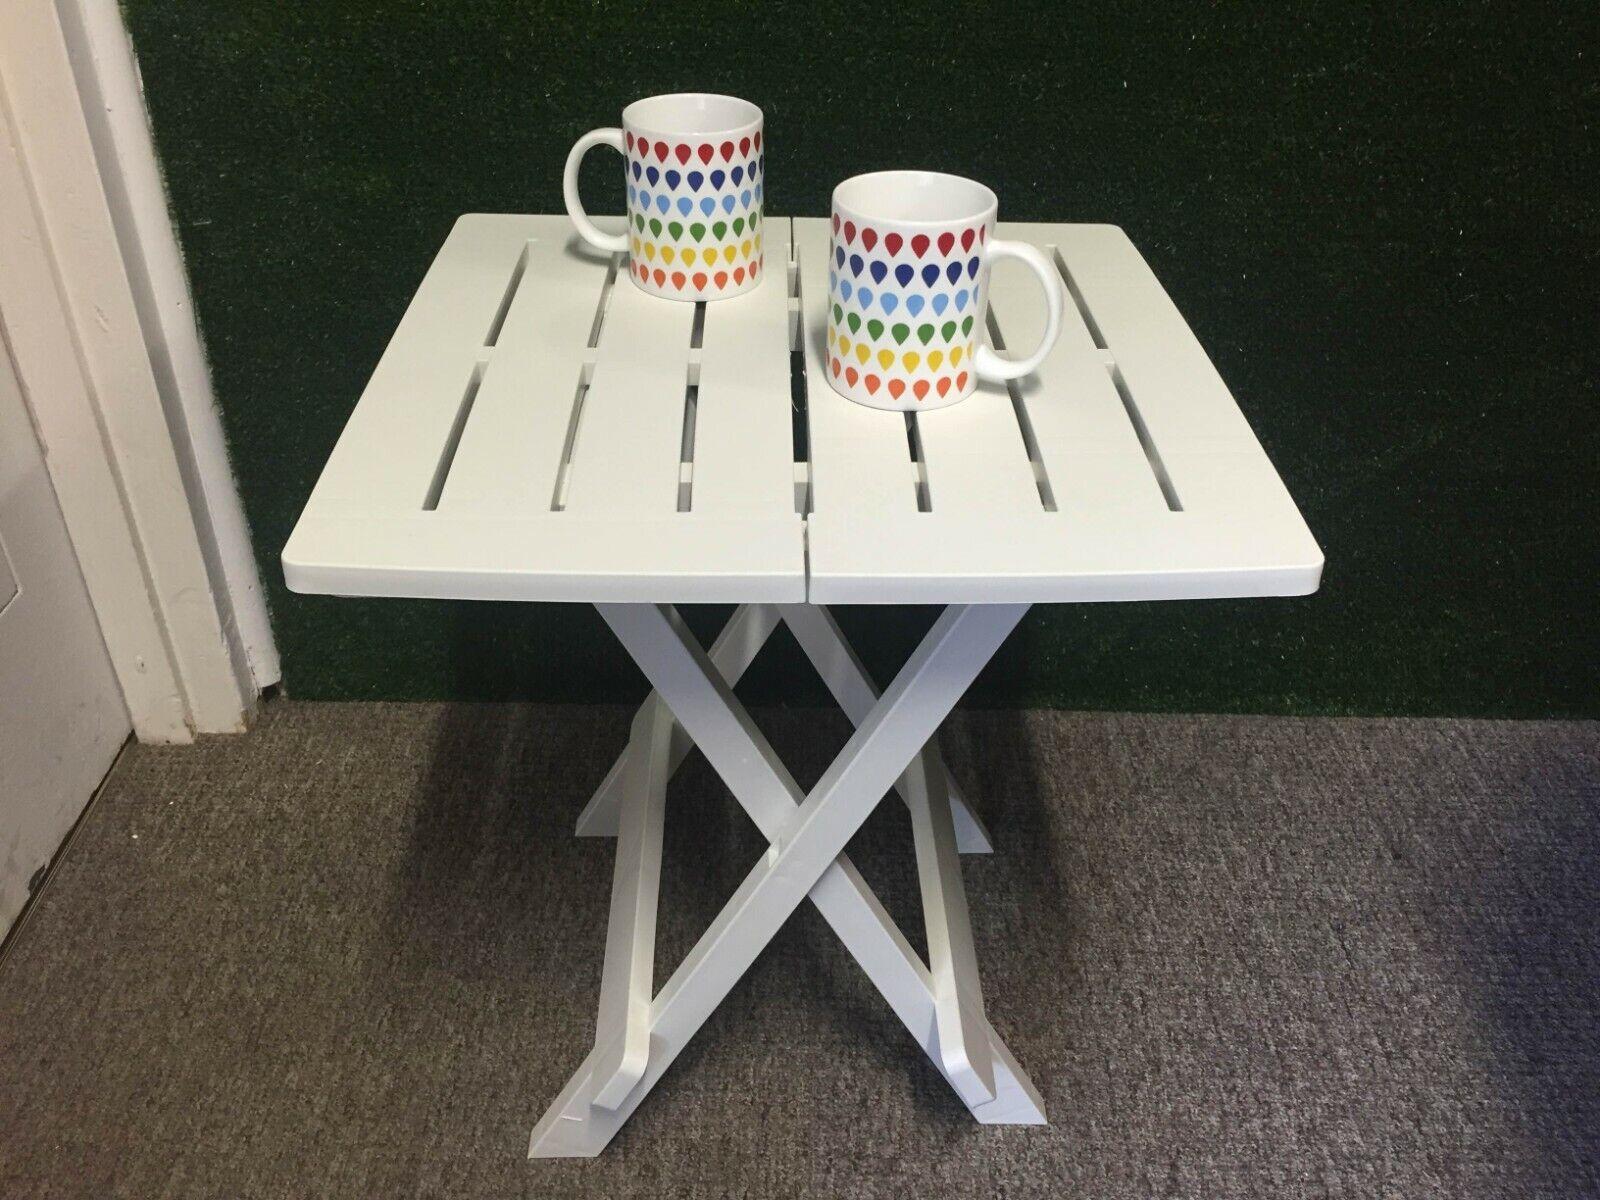 Garden Furniture - Patio Side Table White Plastic Bistro Balcony Pool Deck Garden Furniture Outdoor